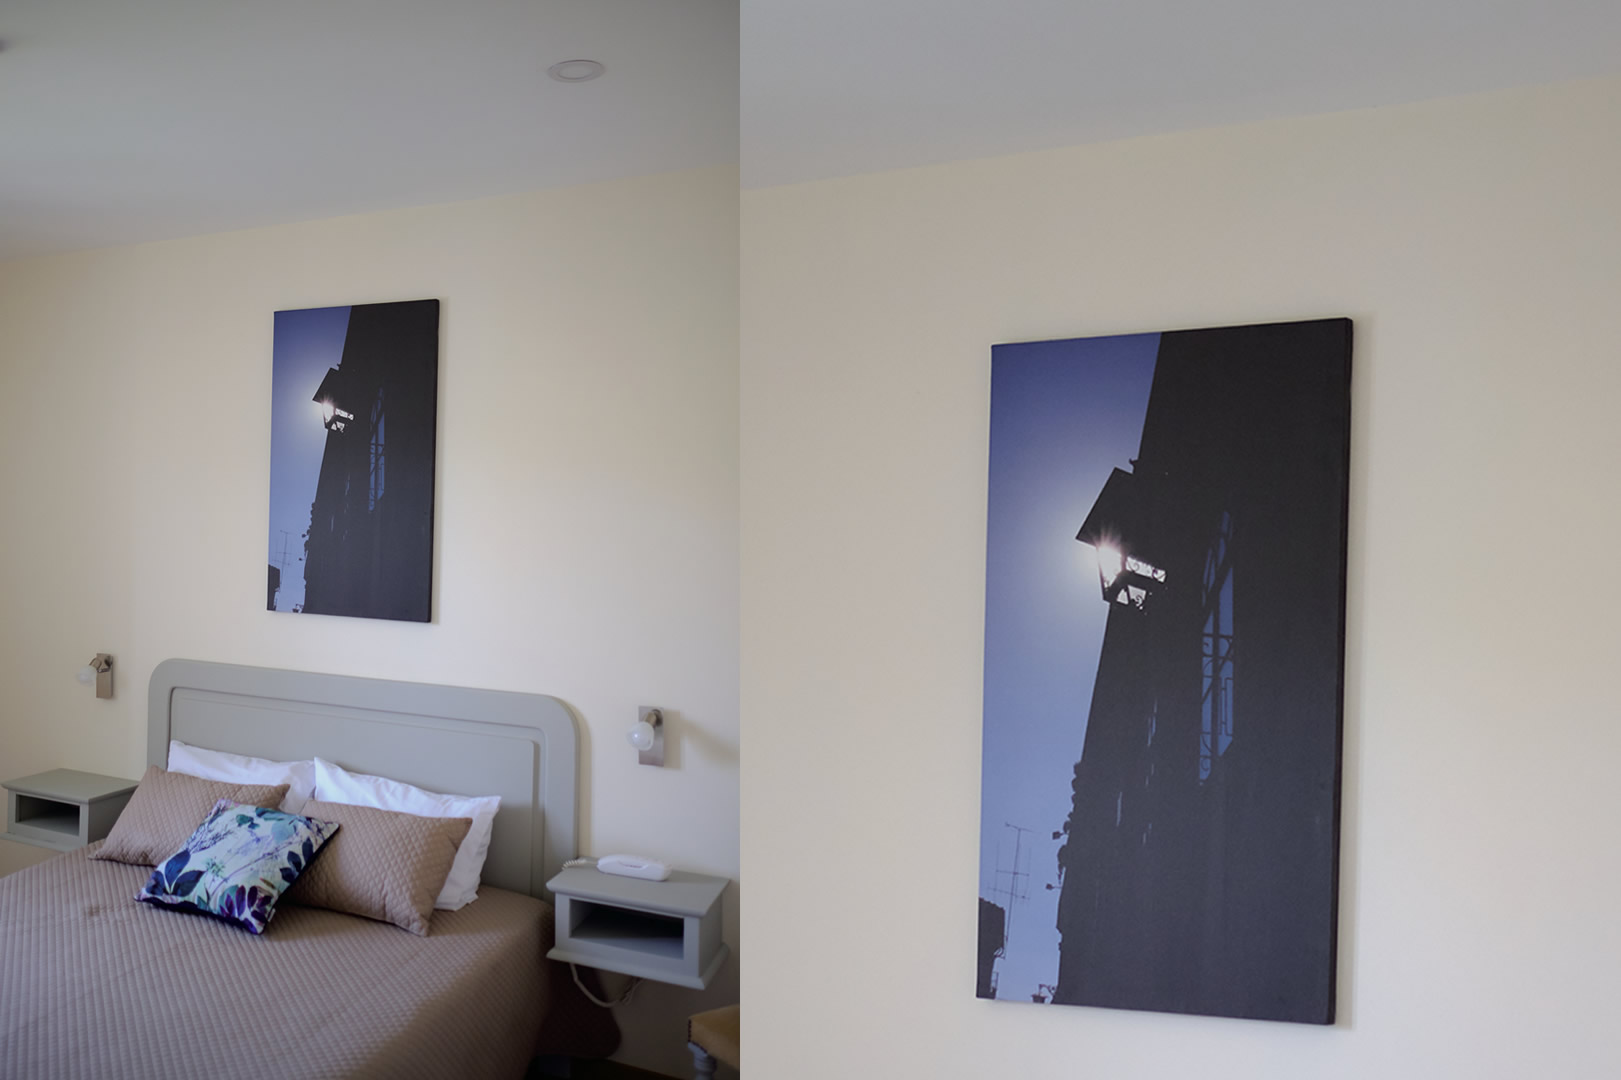 http://www.hotelospoetas.com/wp-content/uploads/2018/03/11CPAA3185_6_7_tonemapped.jpg